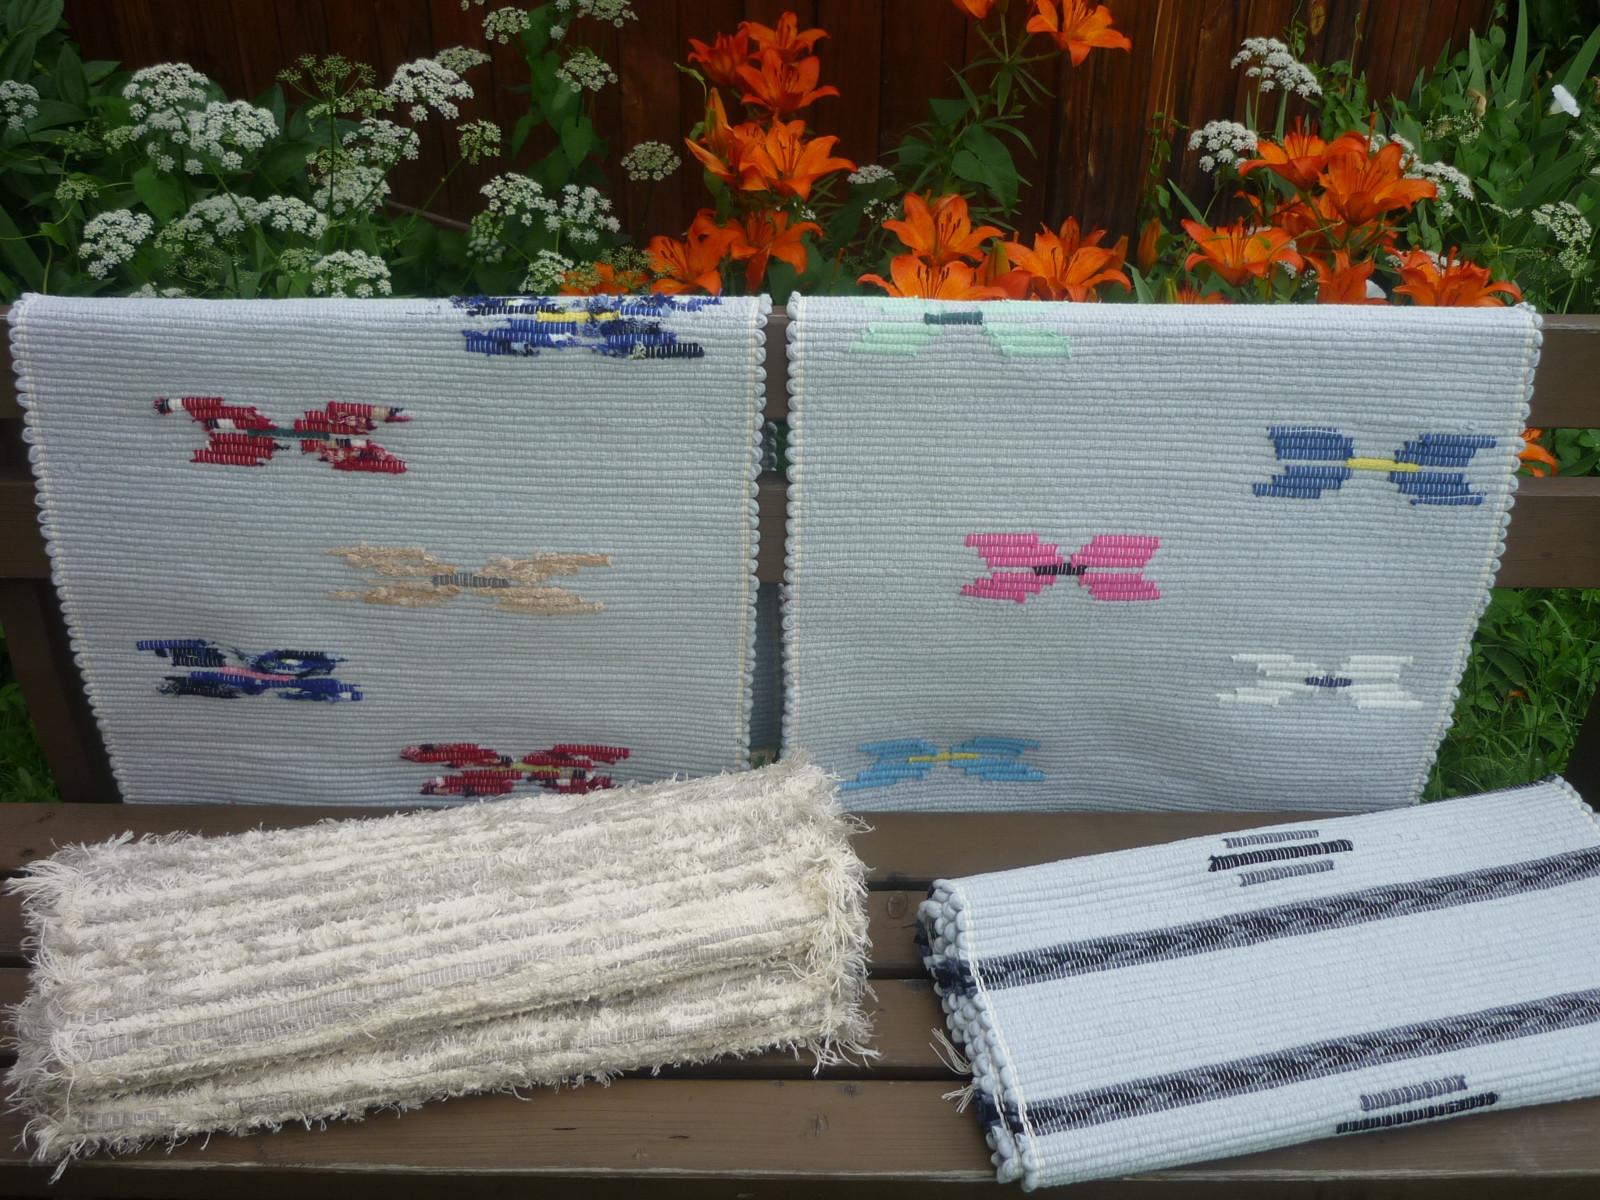 Ručně tkaný koberec -50 x 100 cm - Tkané koberce Halenkov bfe7b920aa